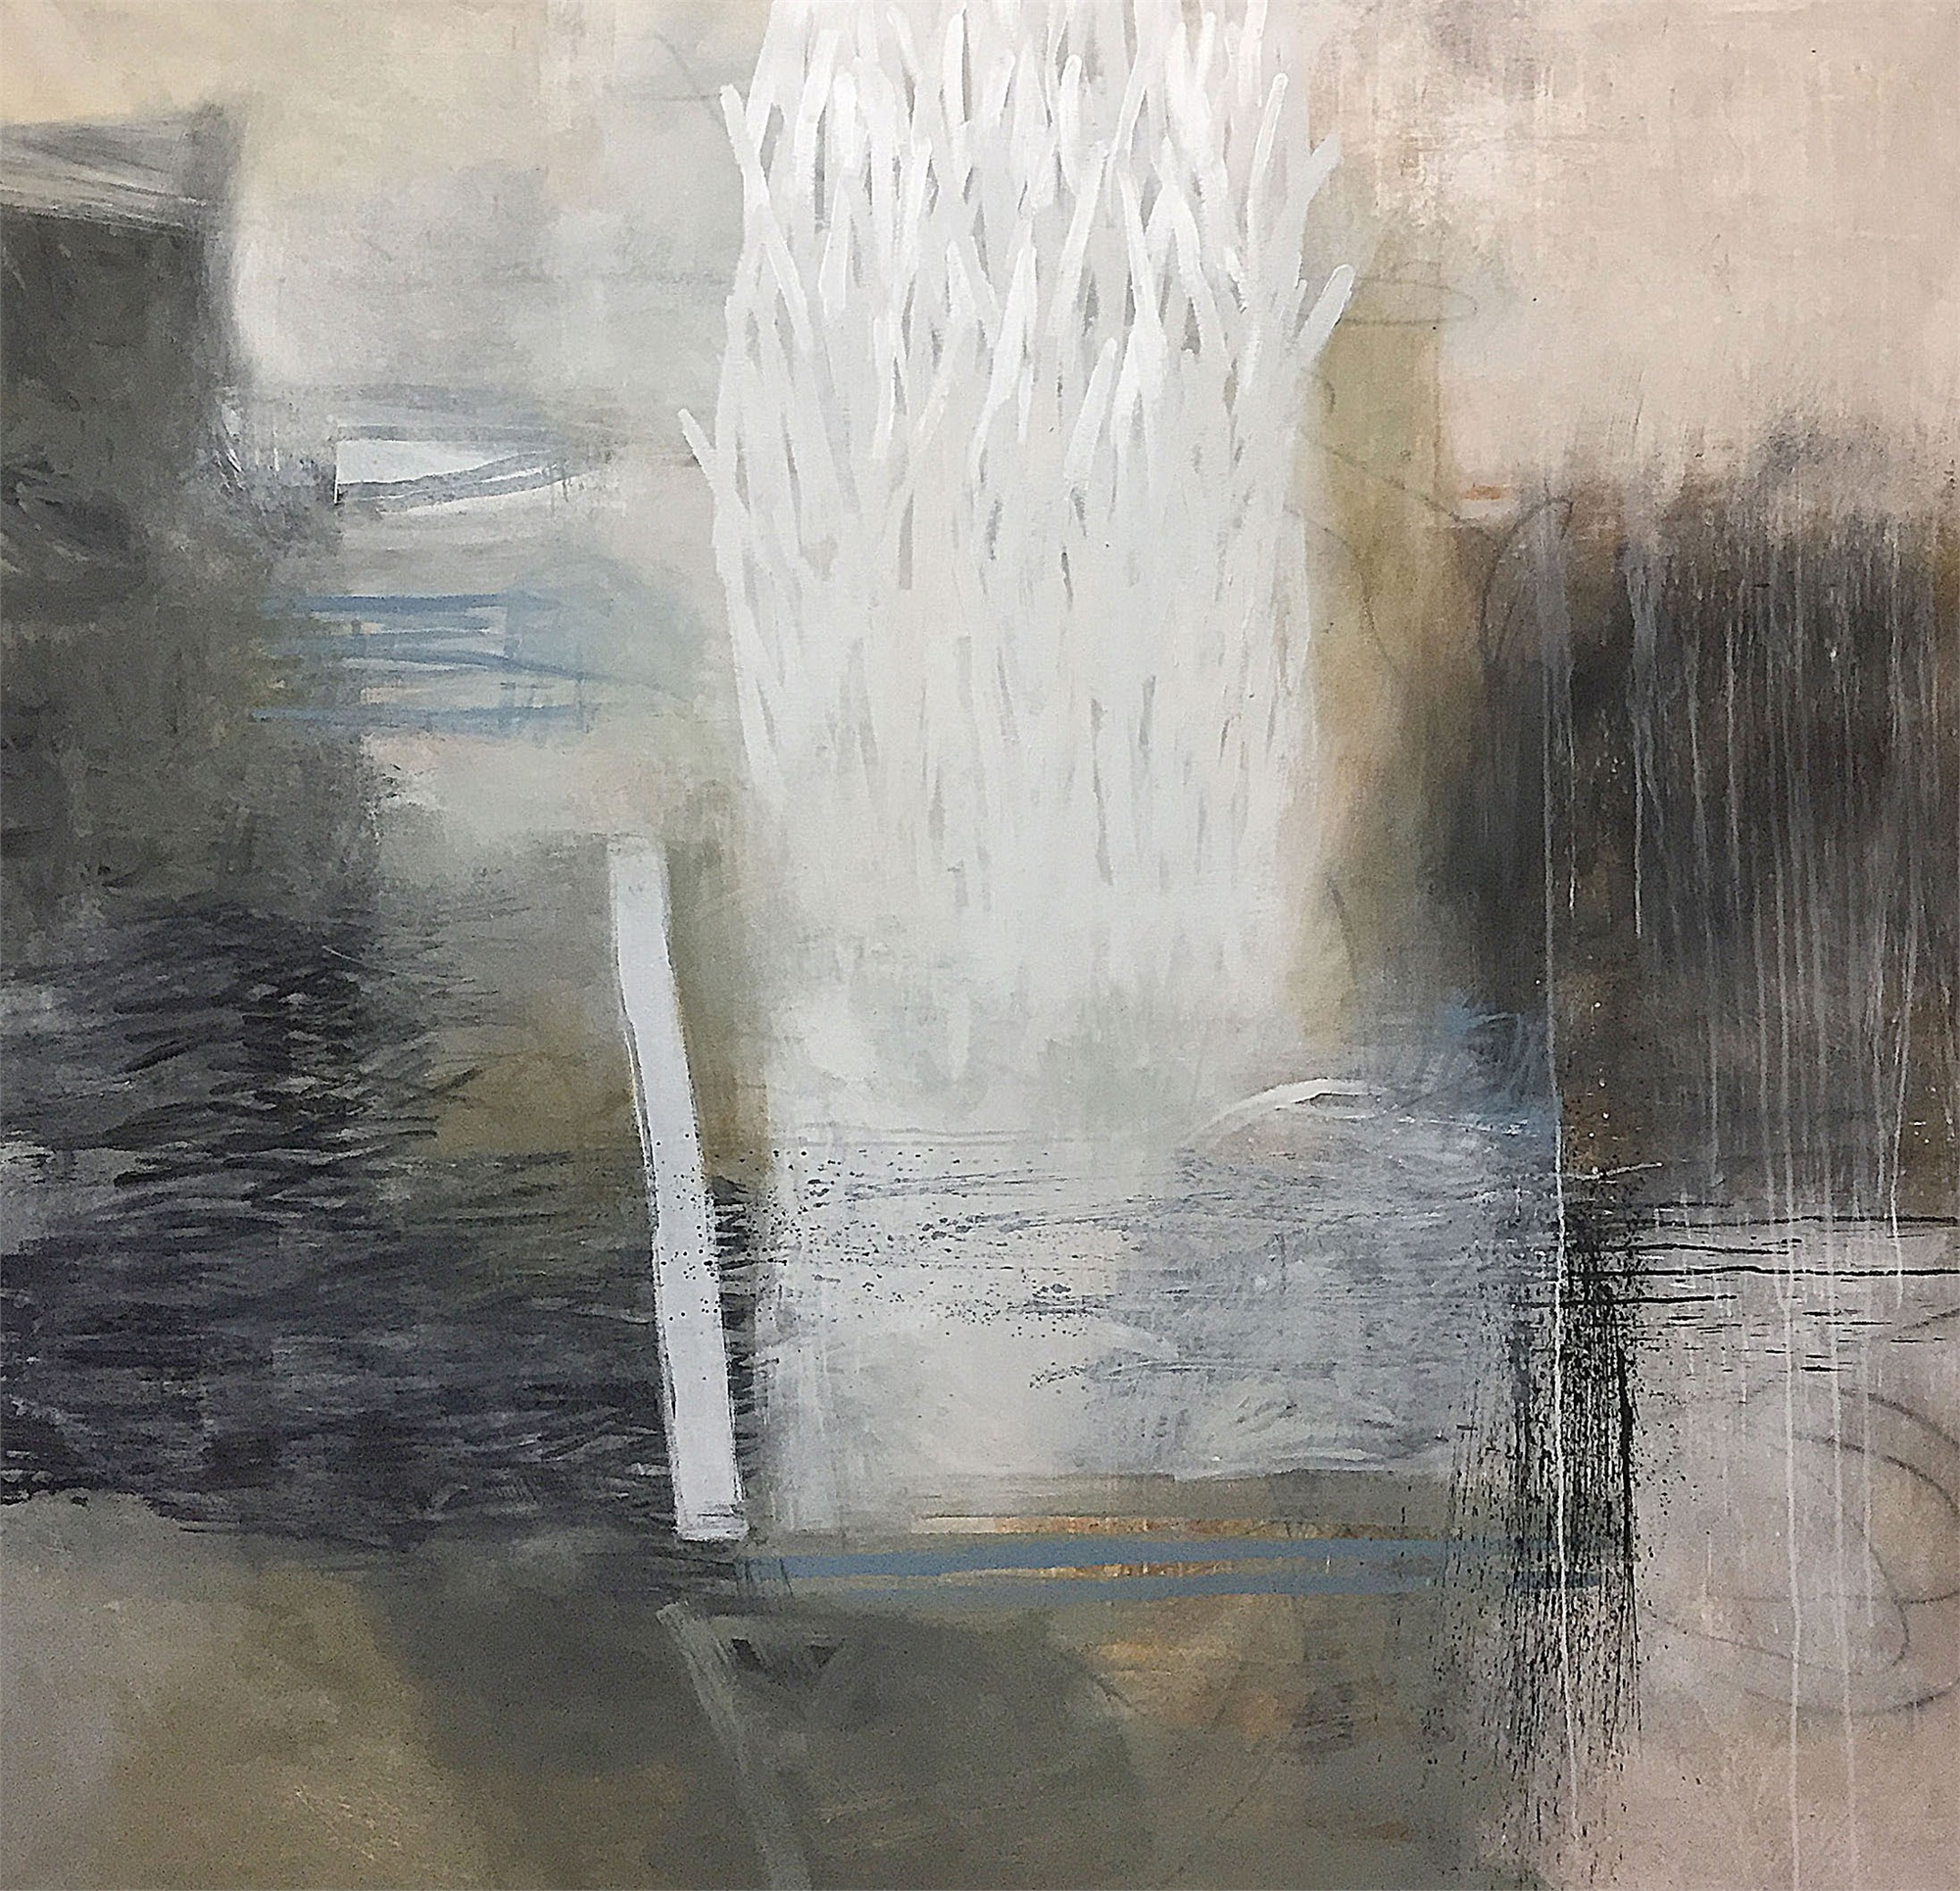 Untitled 198031 by Karen Roehl